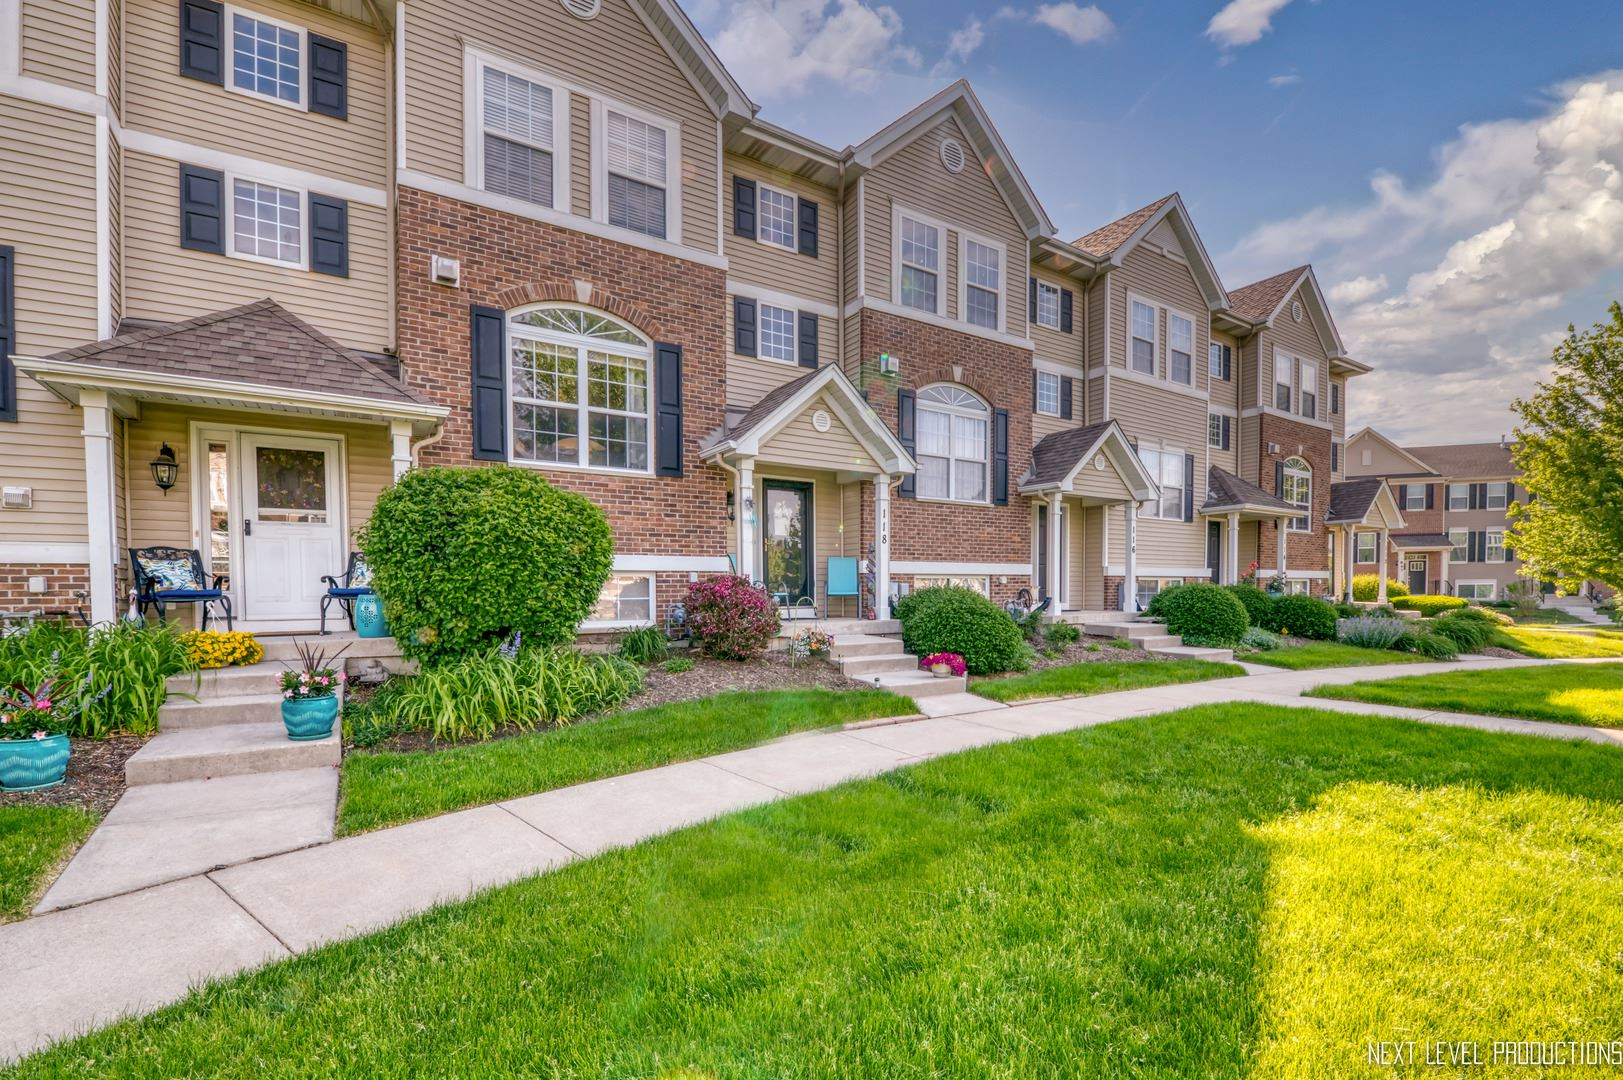 Photo of 118 Lakeshore Drive, Oswego, IL 60543 (MLS # 11090011)